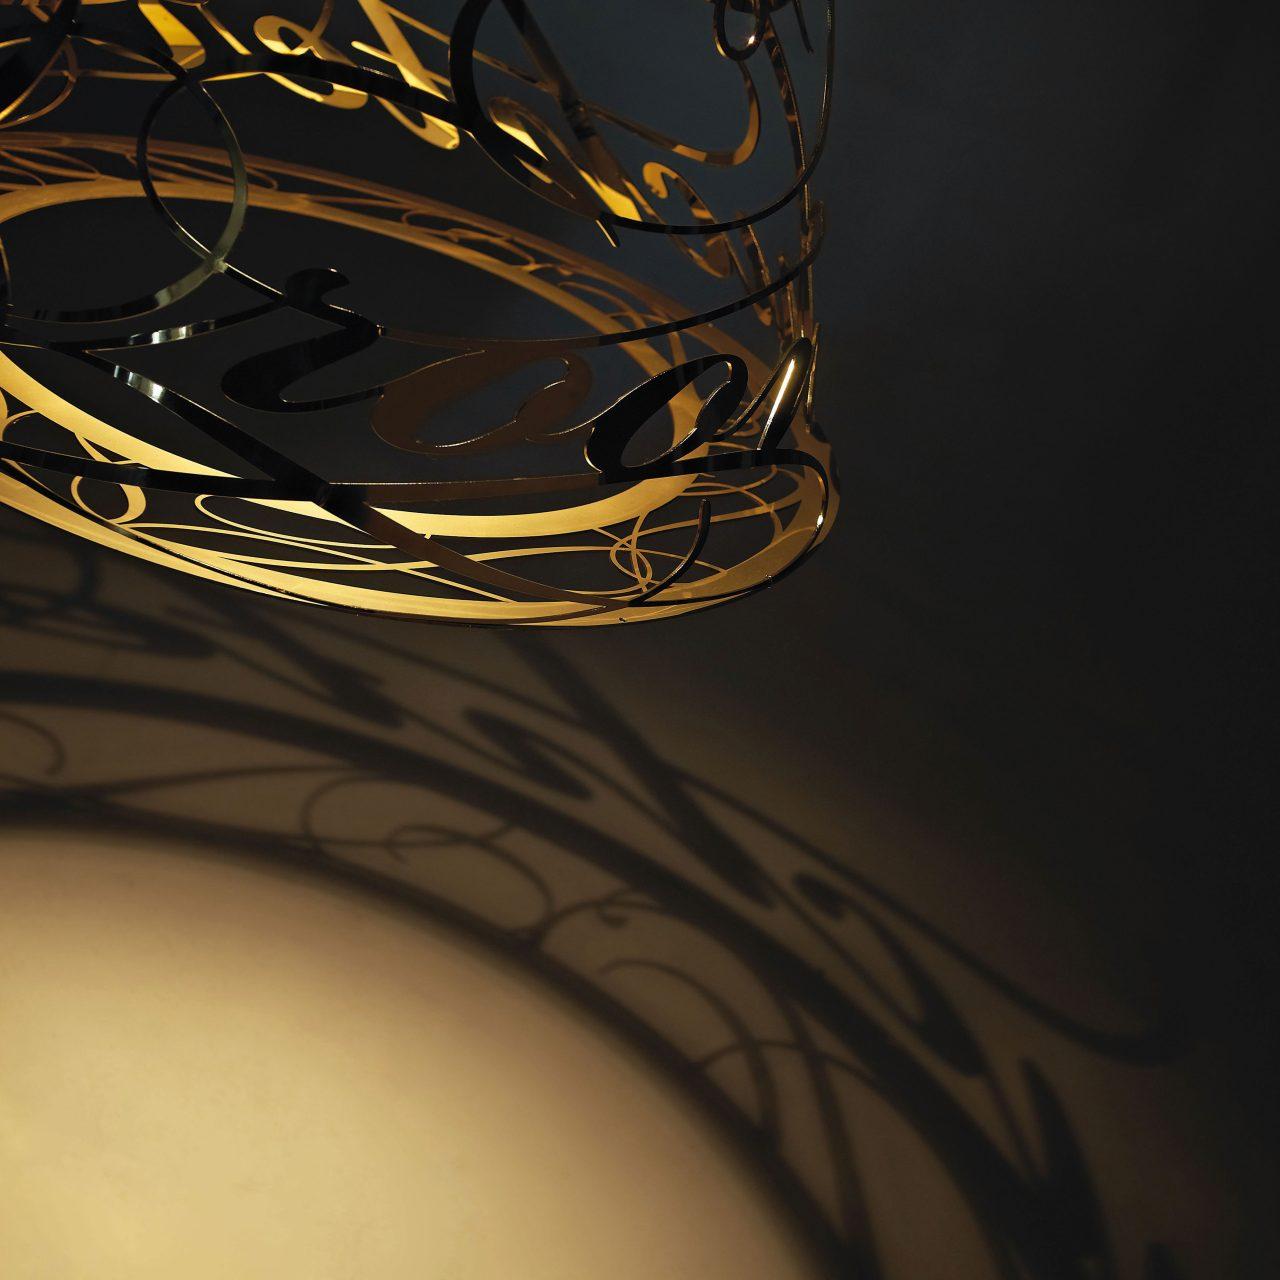 jacco-maris-ideefixe-detail-4200x4200px